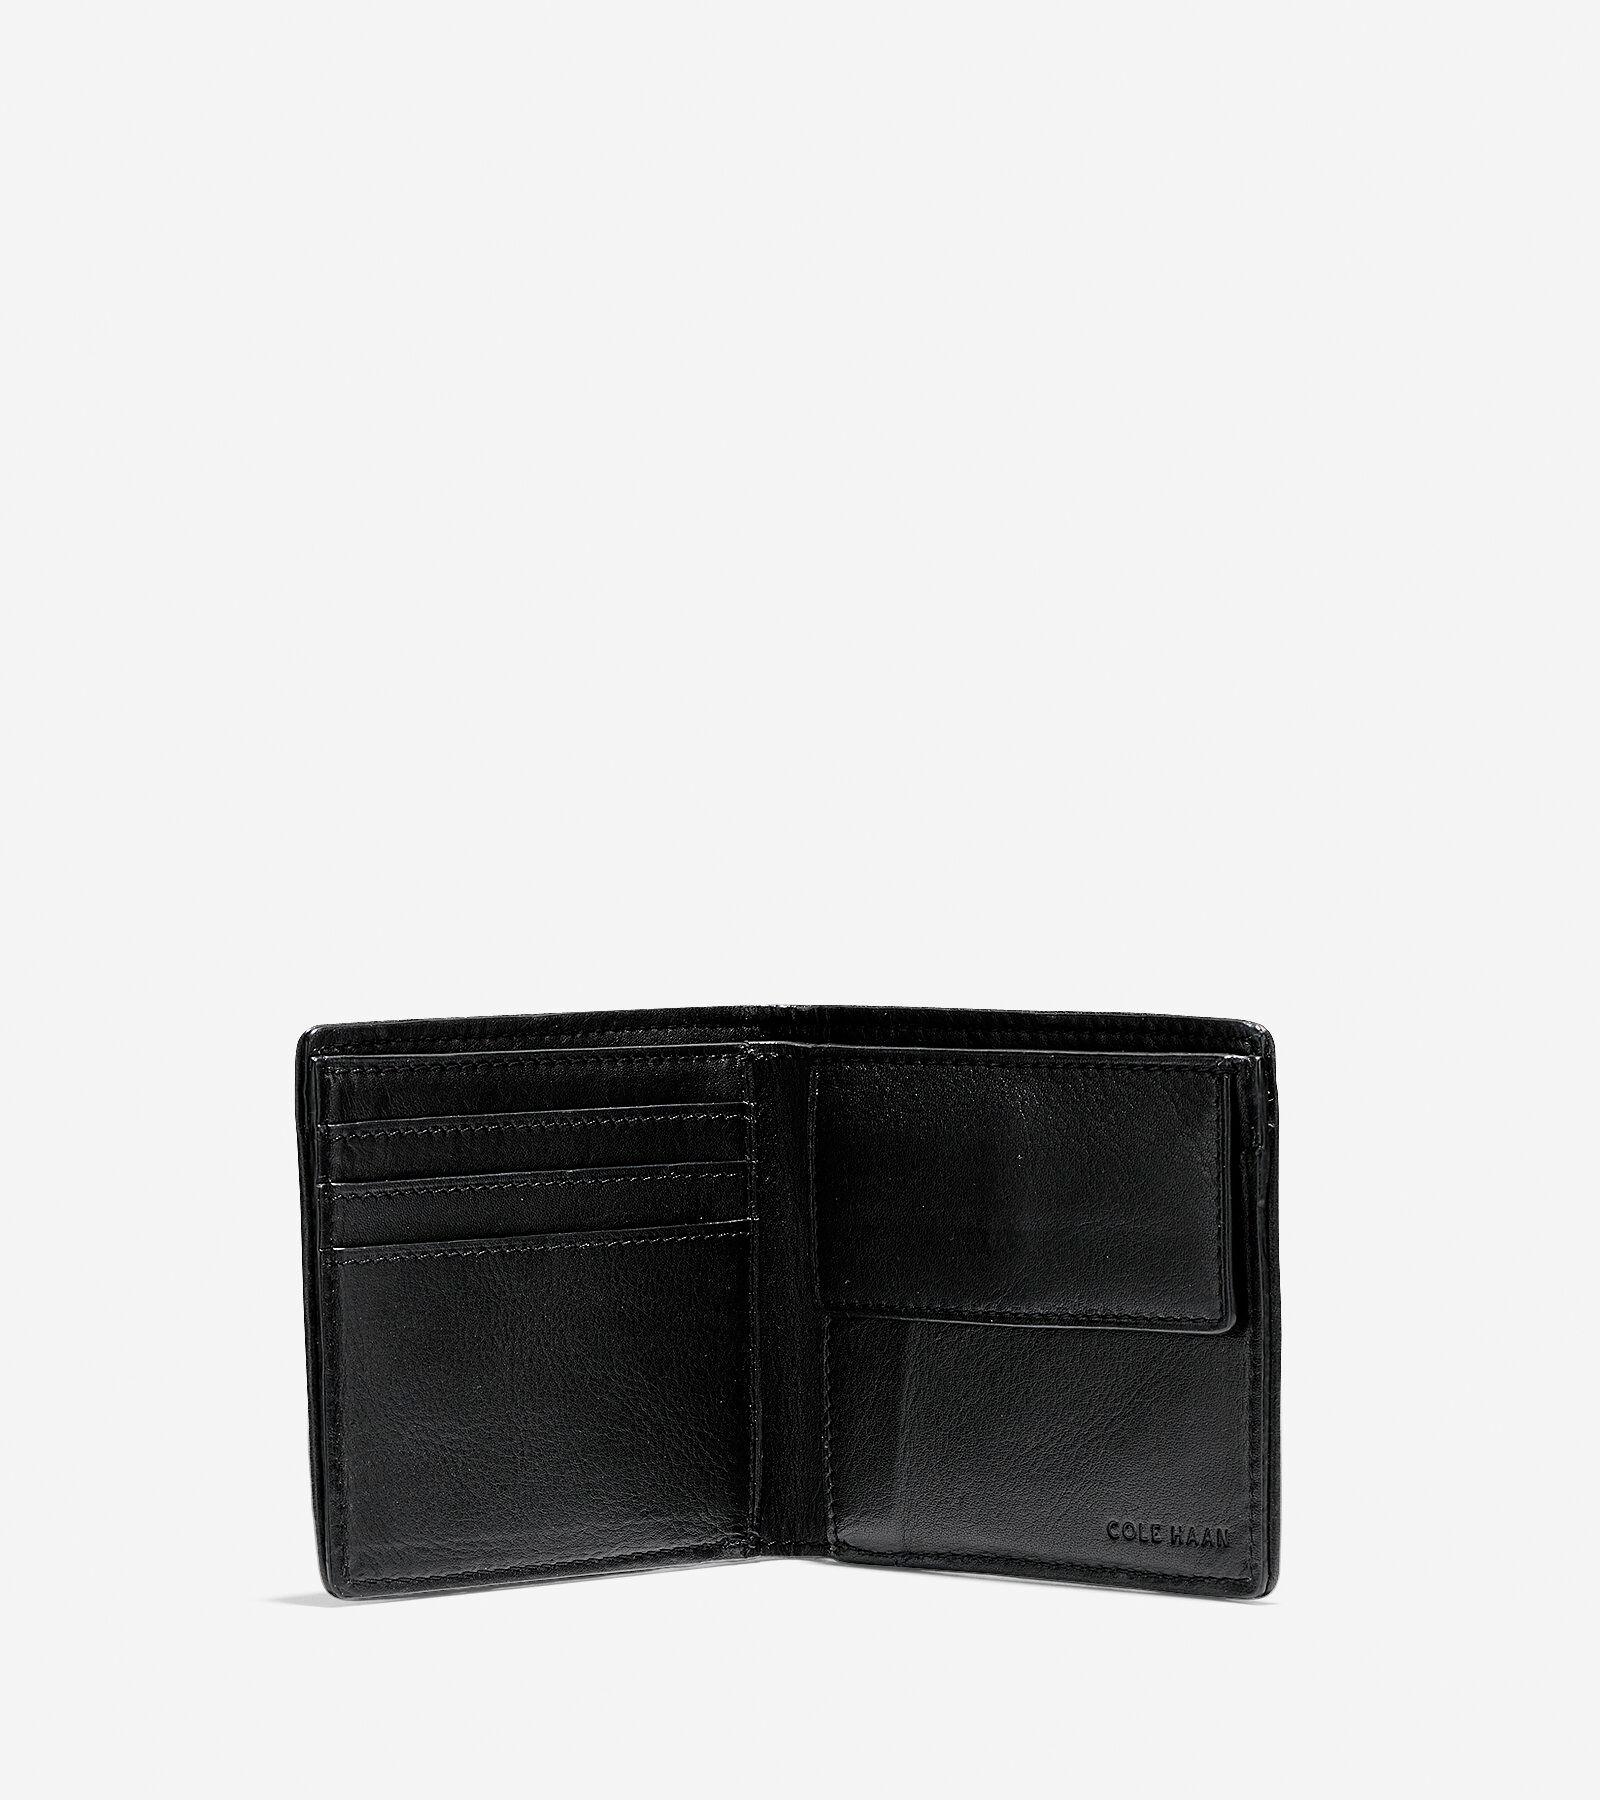 Cole Haan BRAYTON WEAVE Bifold Coin Pocket Wallet